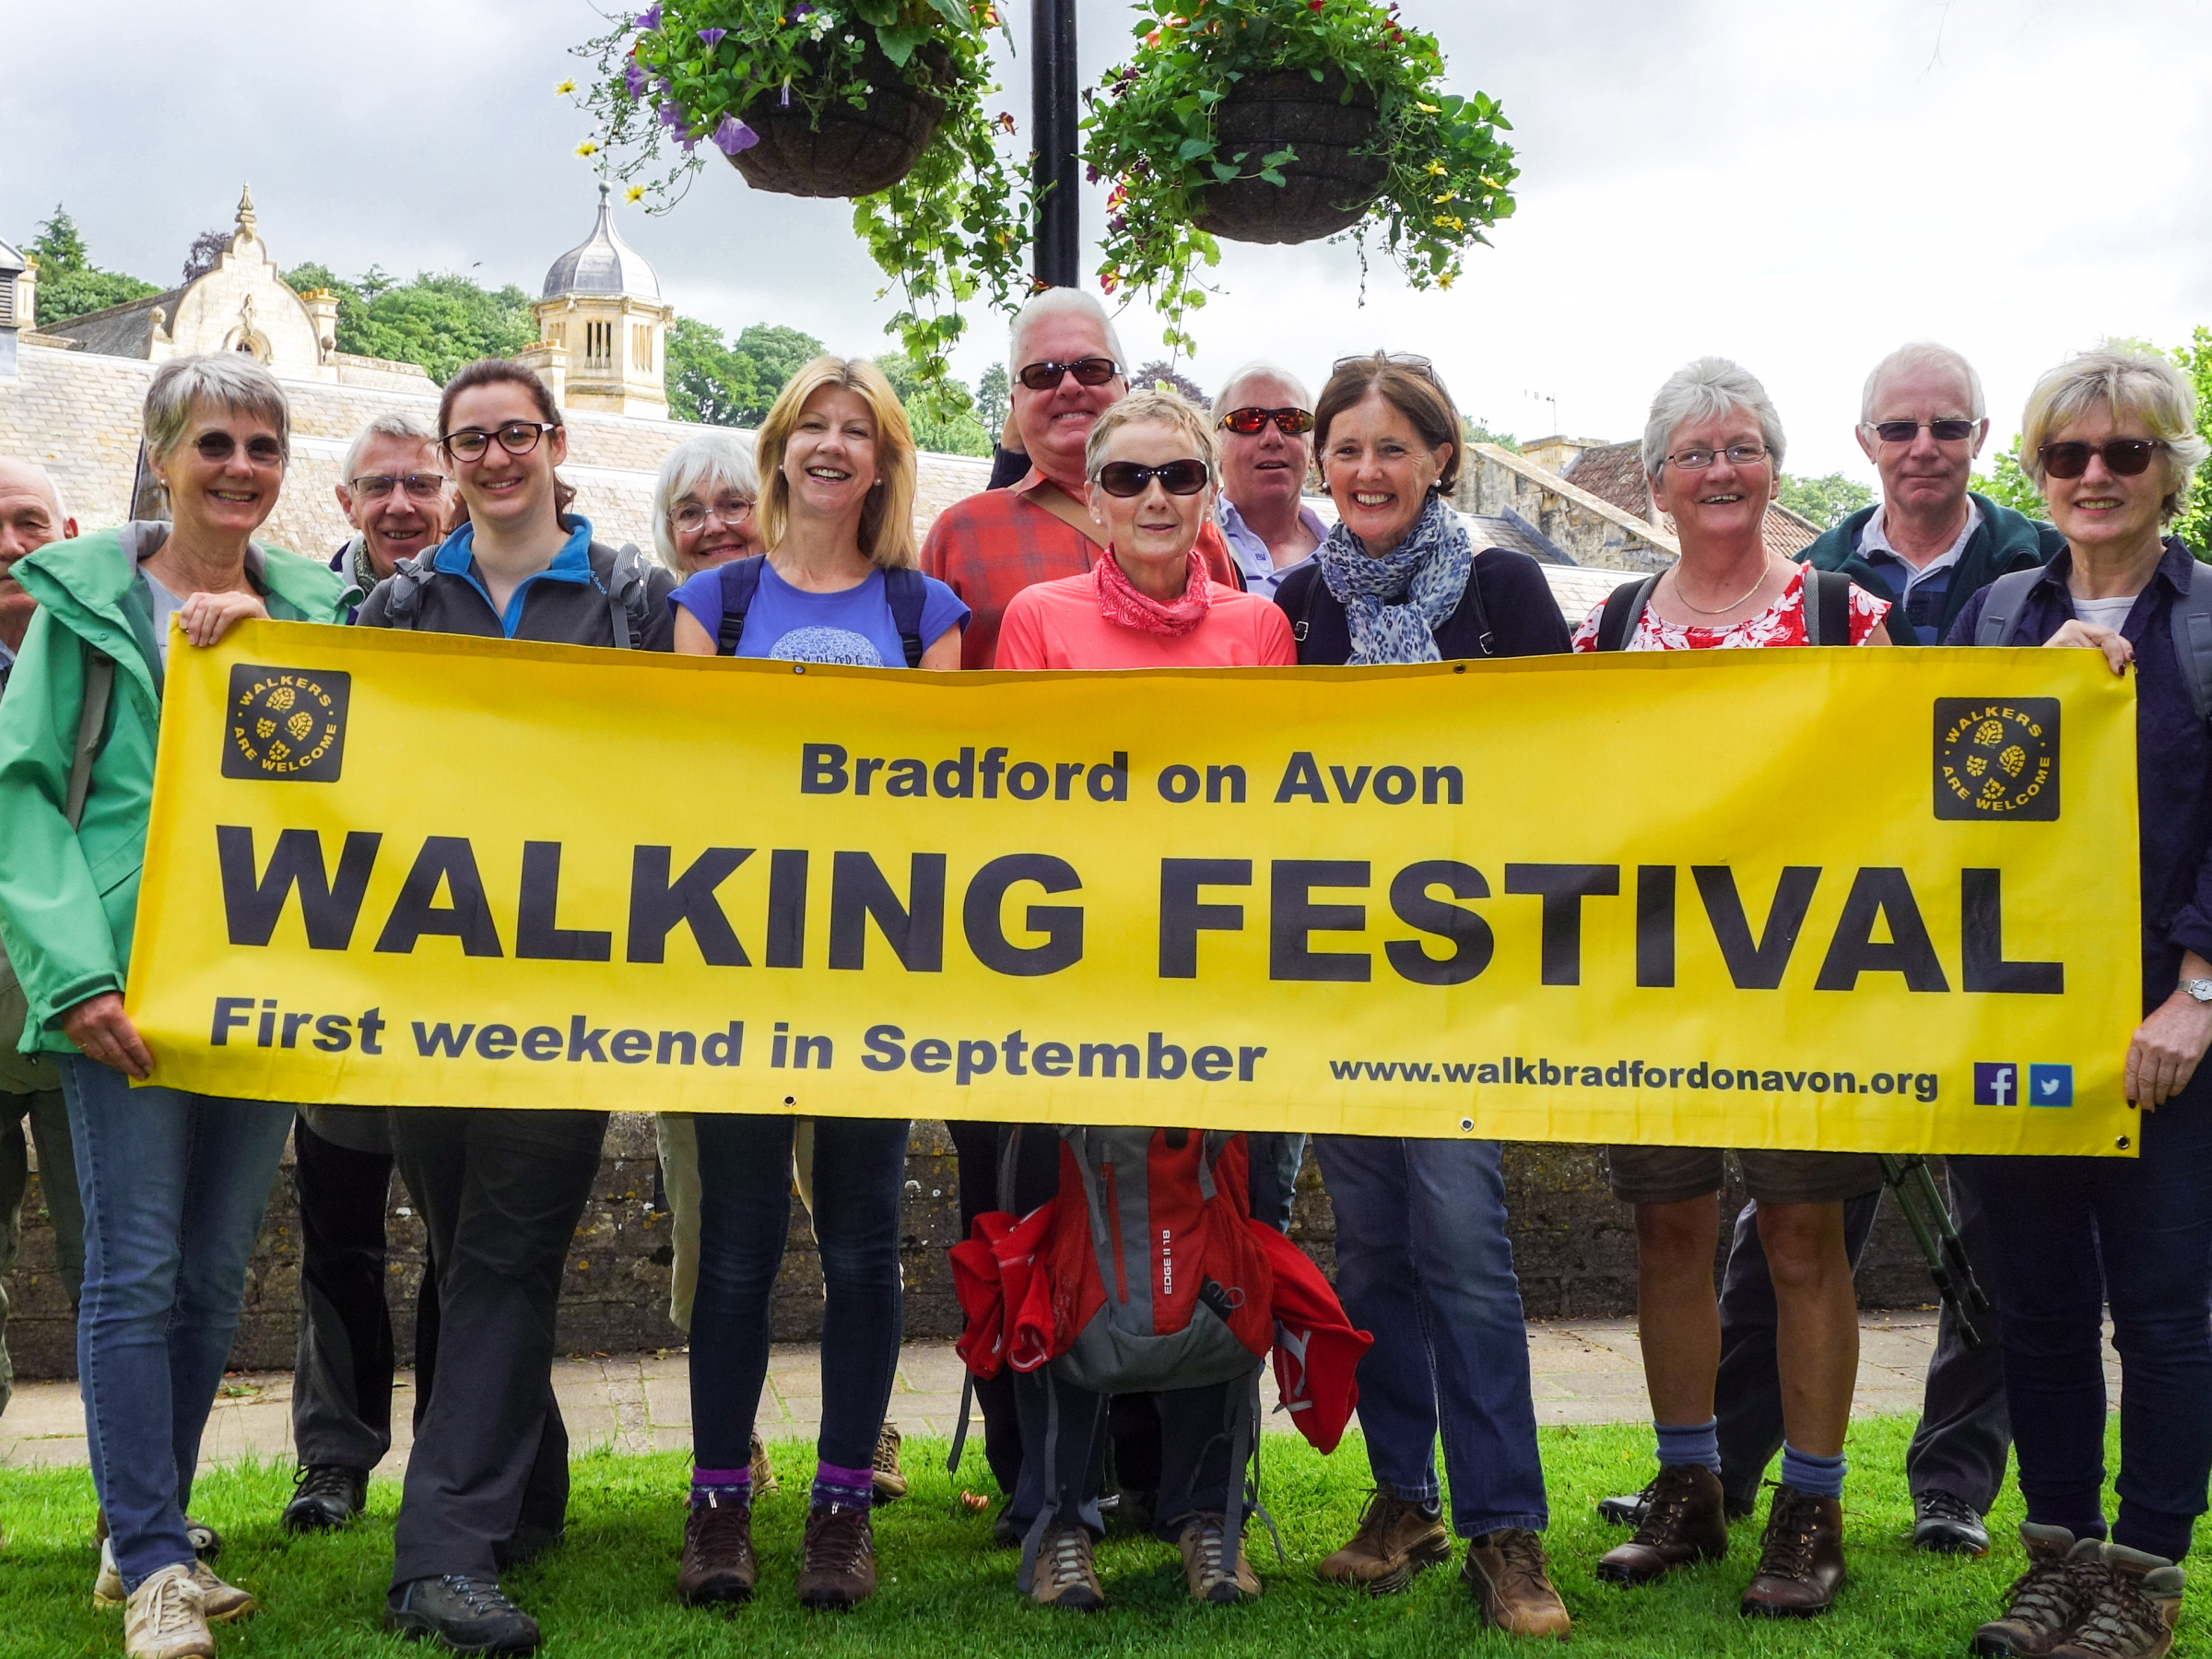 Bradford on Avon's 9th Walking Festival